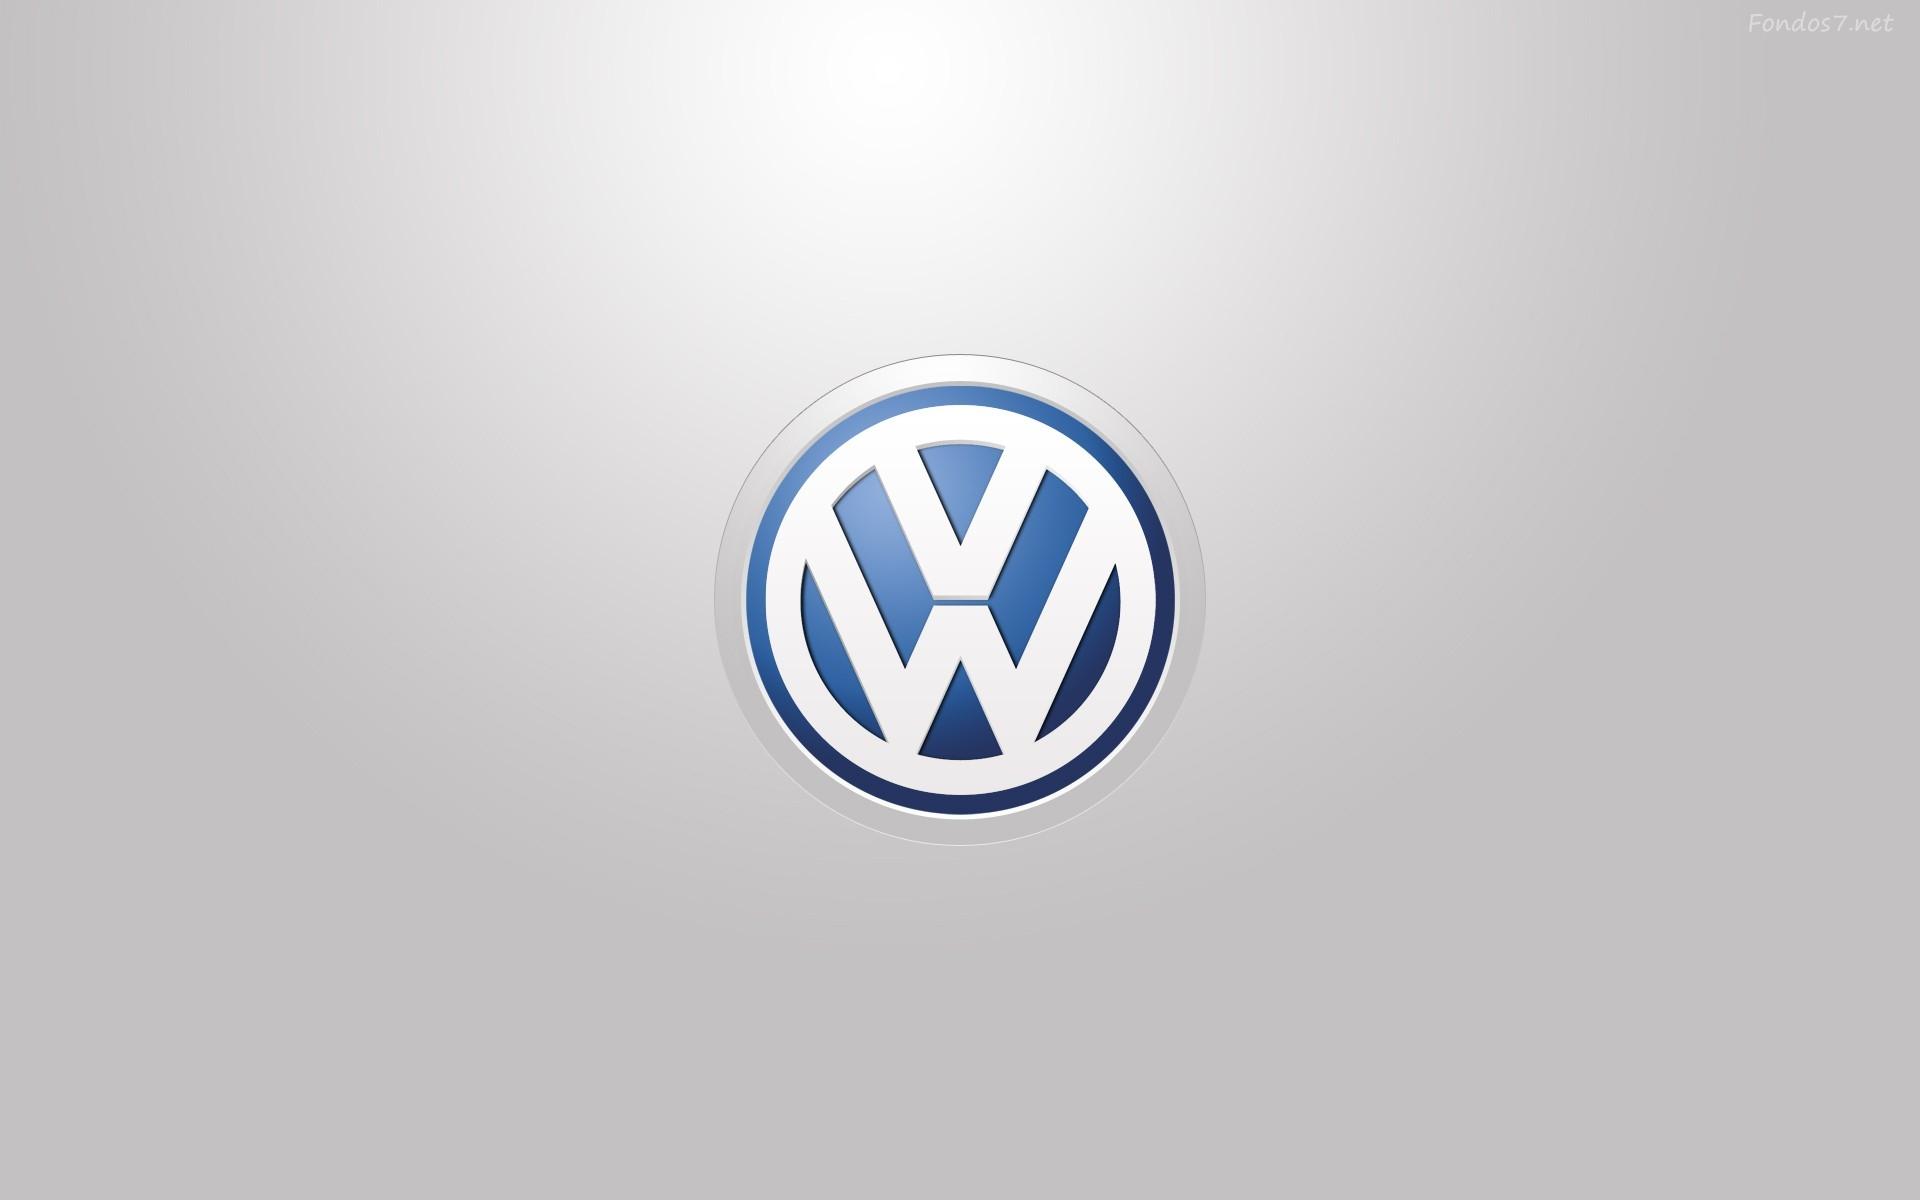 Fondos de pantalla volkswagen logo hd widescreen Gratis imagenes 7963 1920x1200